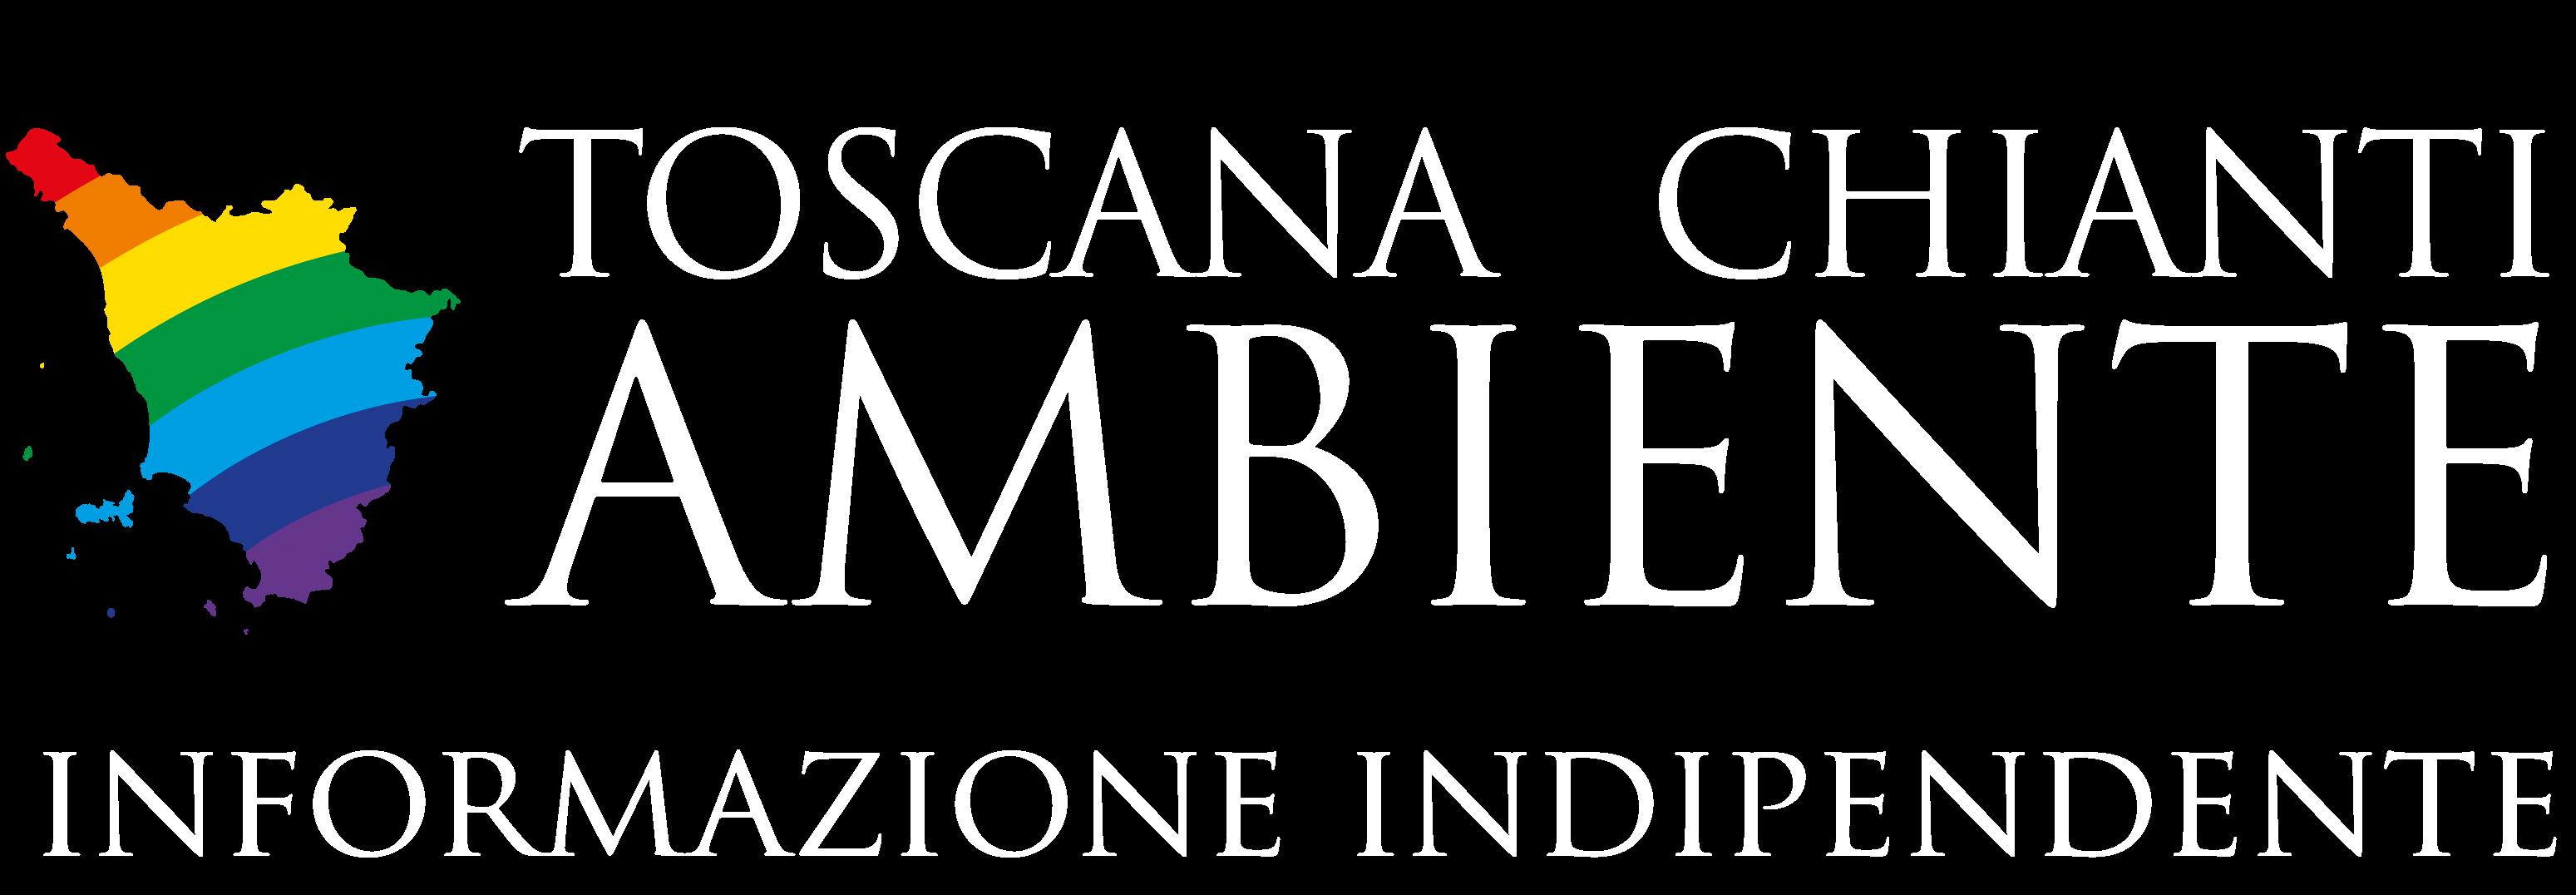 Toscana Chianti Ambiente